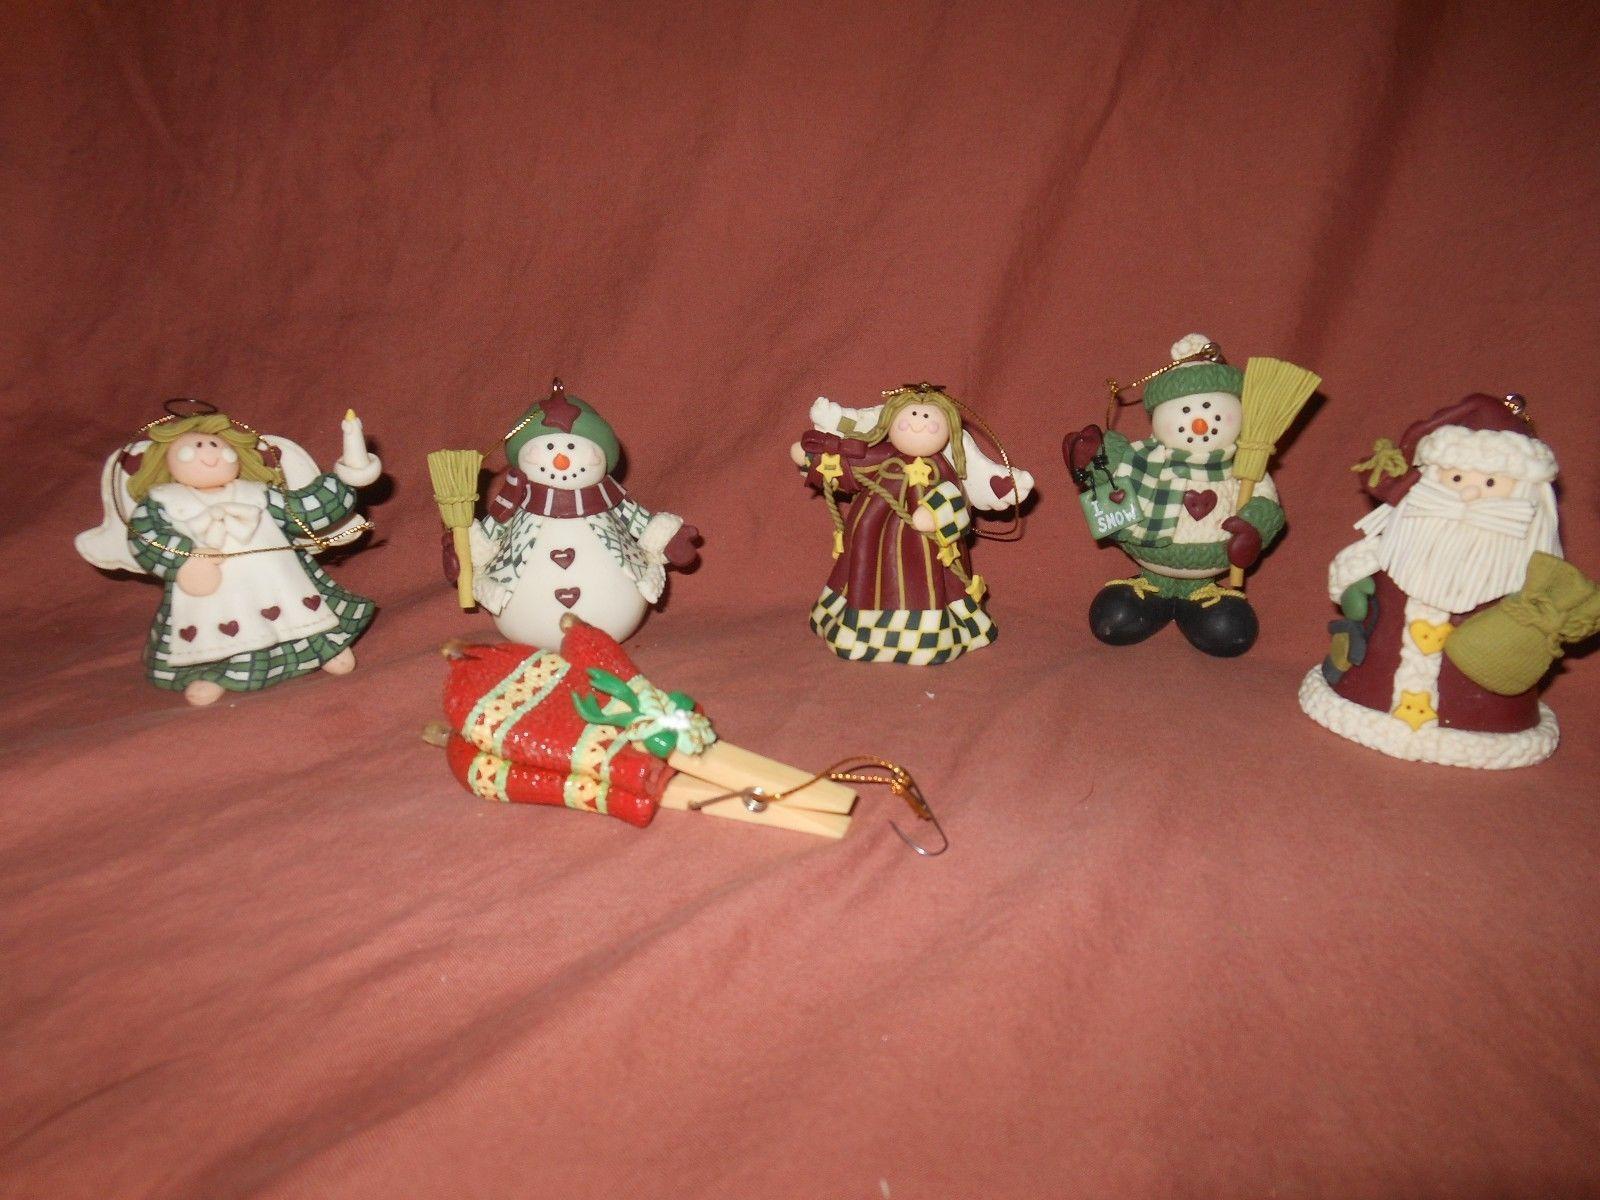 6   Christmas Tree Ornaments -Resin Santa Angel Snowman Mittens https://t.co/0tKDmsX9tB https://t.co/98it3BGPcC